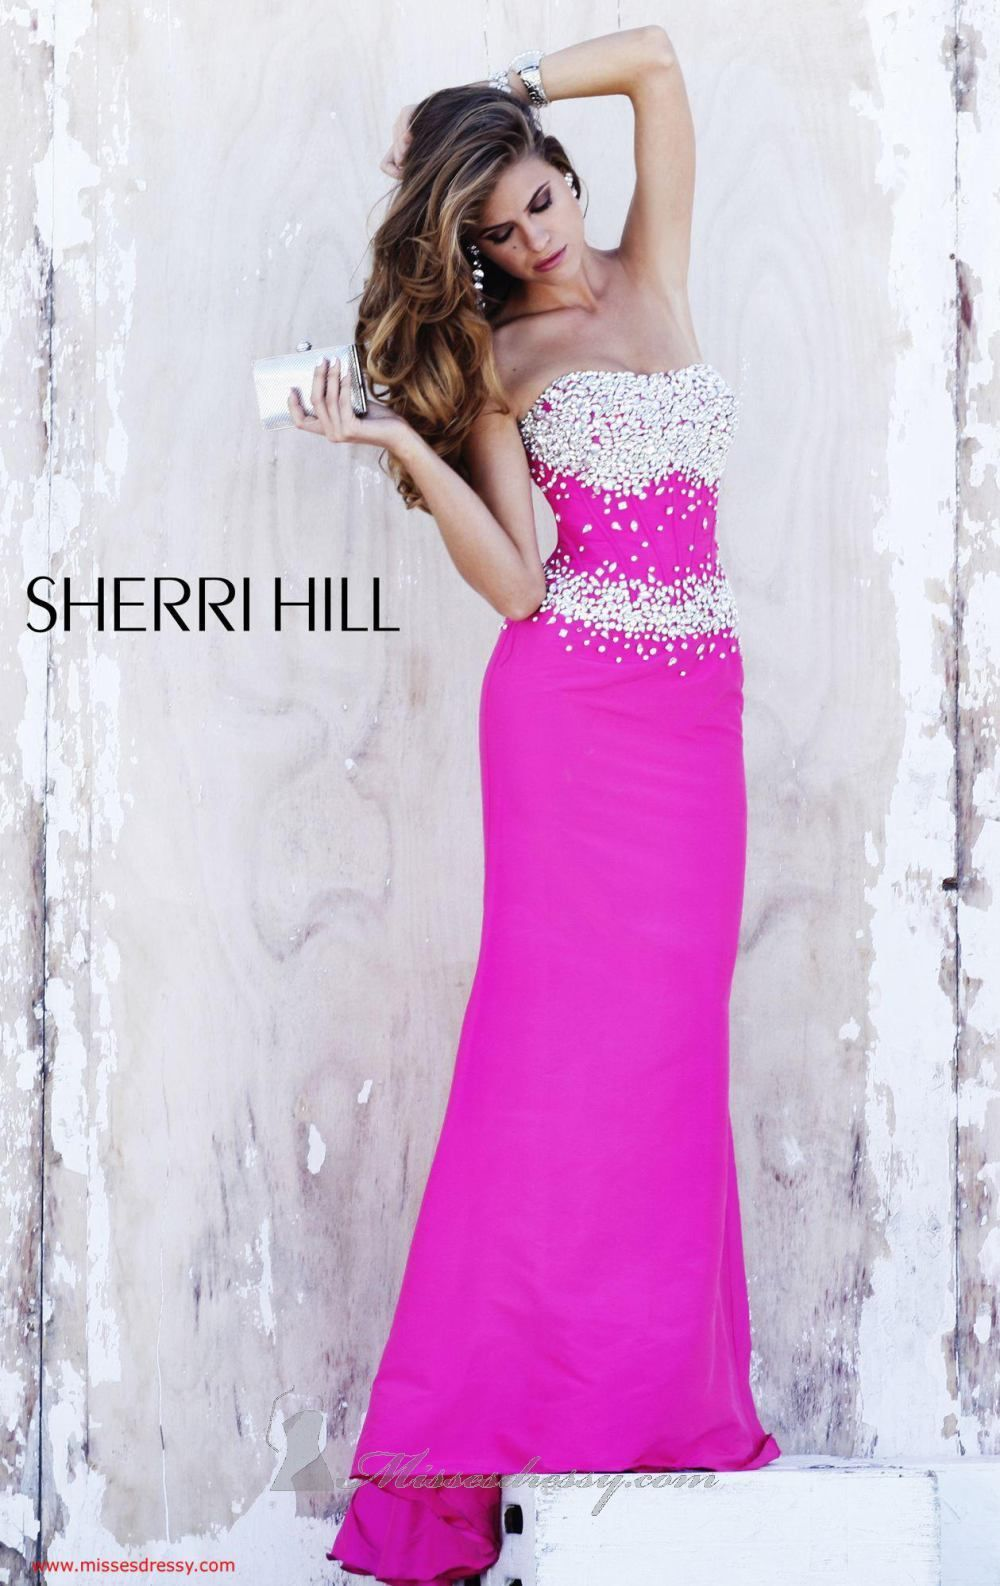 sherri hill | PROM COM | Pinterest